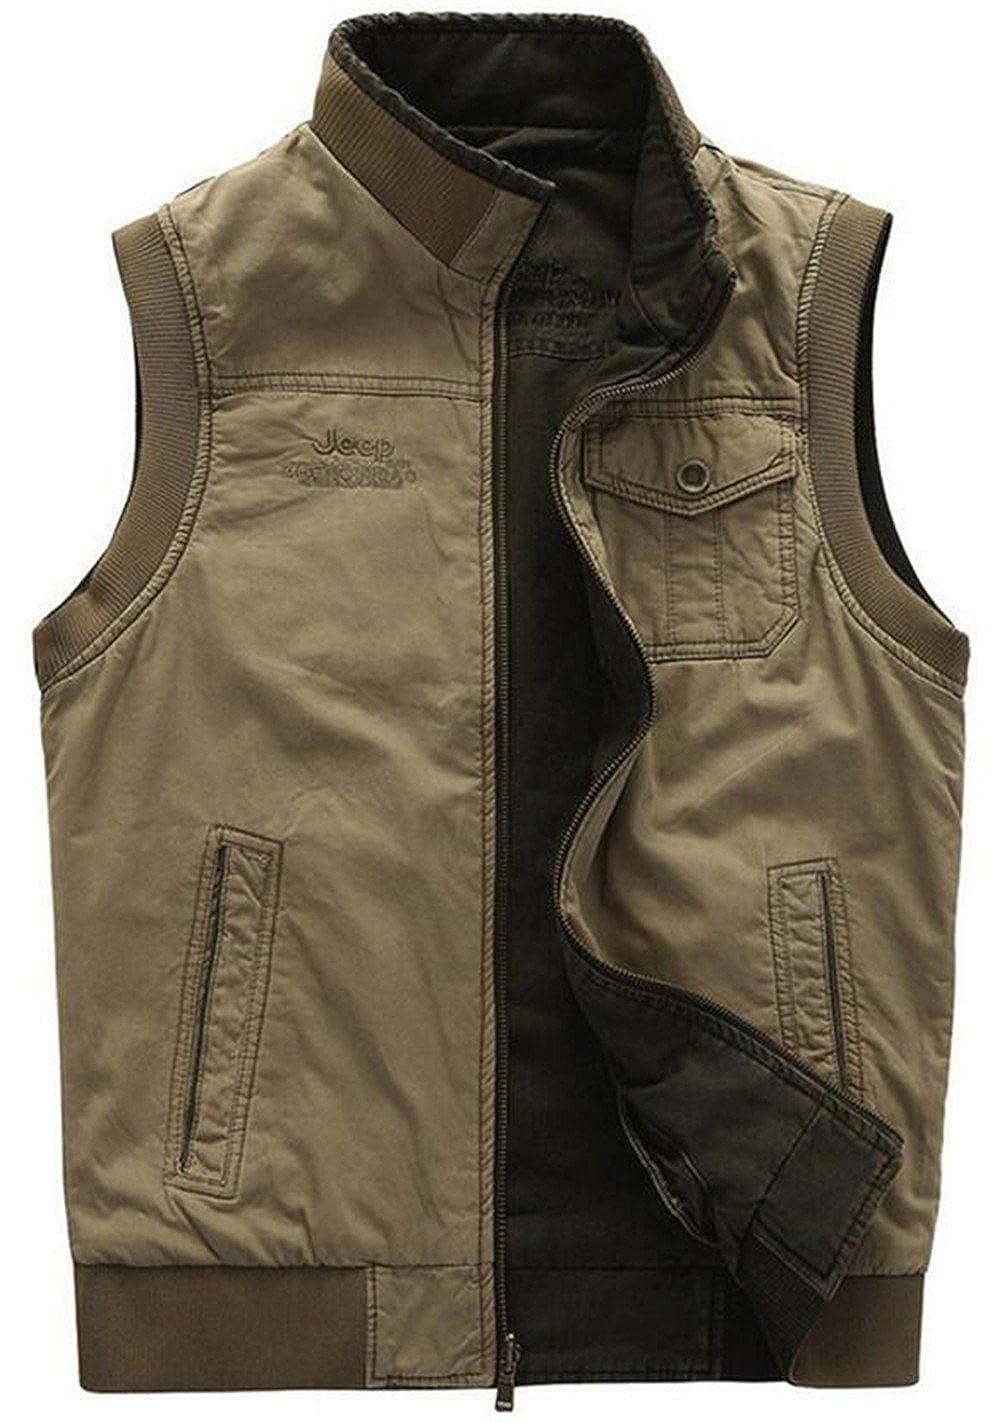 JEWOSOR Mens Cotton Pockets Military Gilets Outdoors Travels Sports Vest XS-5XL VEST8522